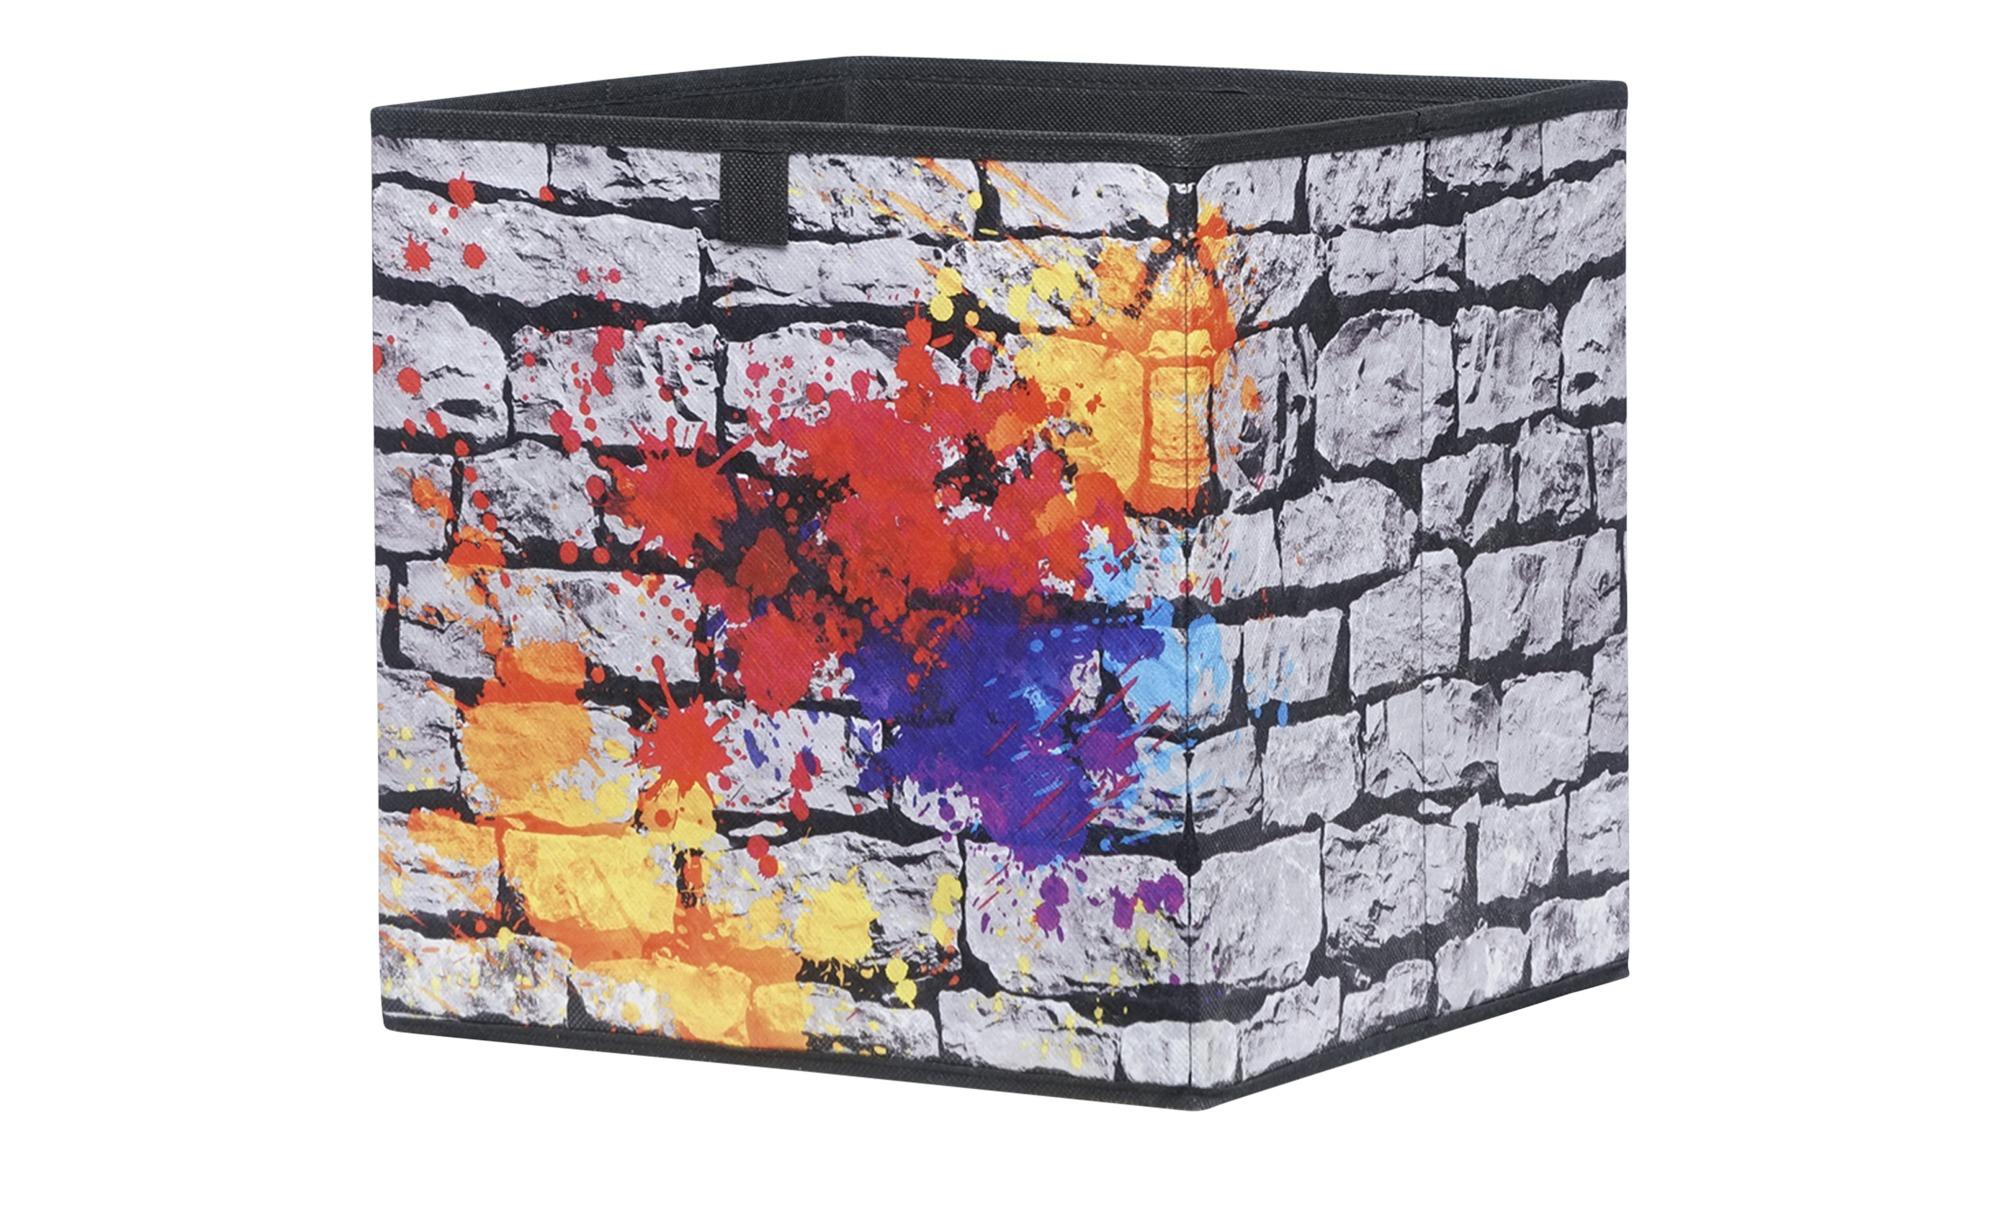 Faltbox ¦ Polypropylen ¦ Maße (cm): B: 32 H: 32 T: 32 Regale > Regal-Aufbewahrungsboxen - Höffner